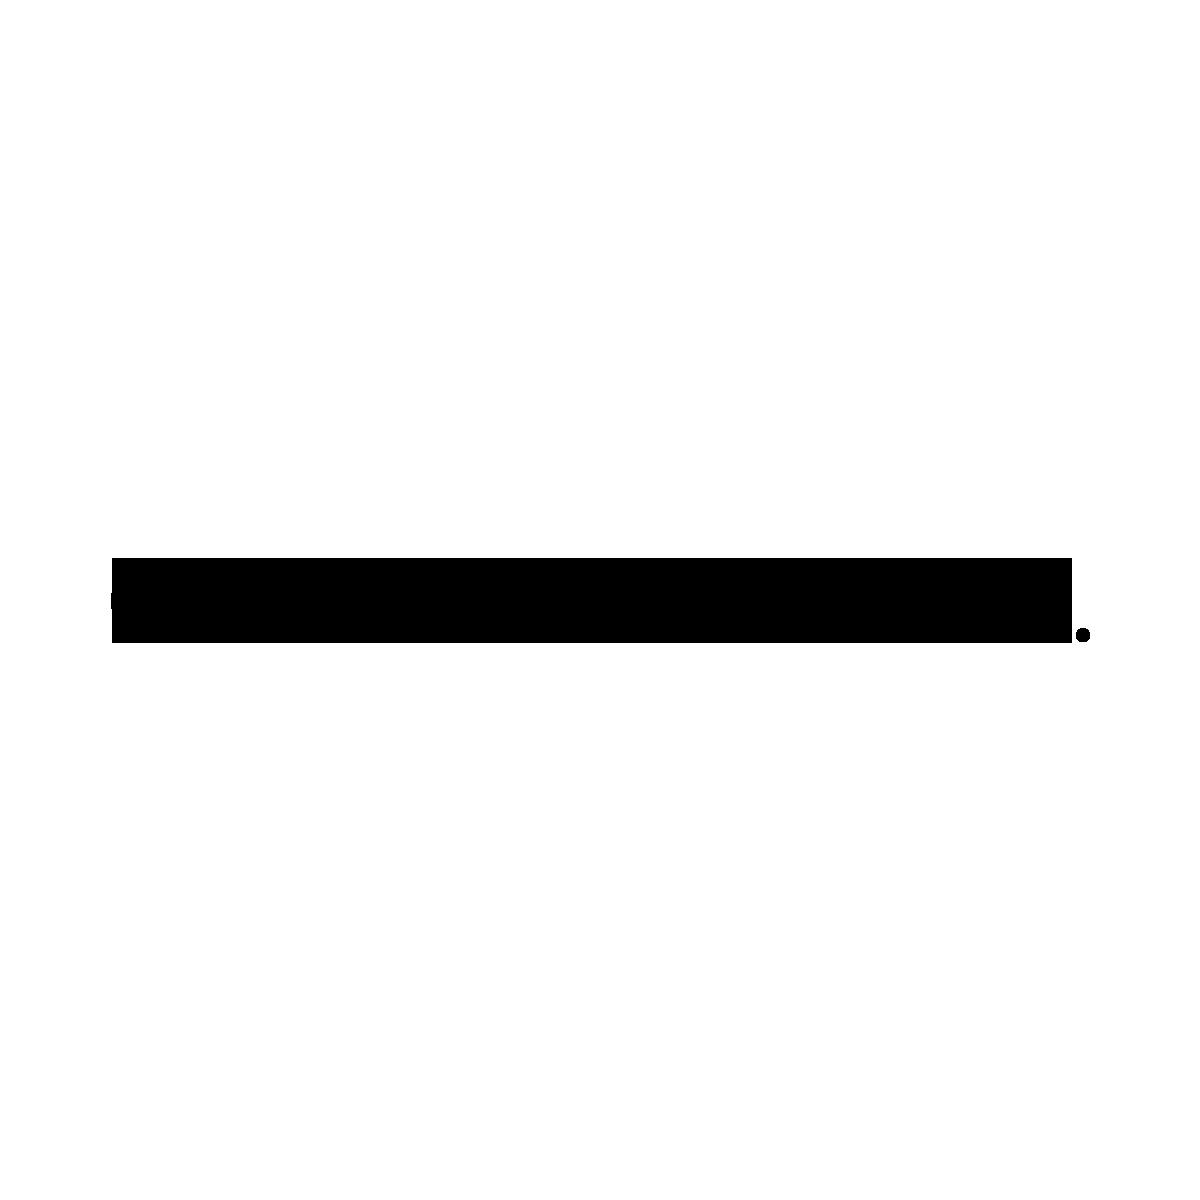 grote schoudertas structuurleer taupe van shabbies amsterdam 283020001 binnenkant steekvak